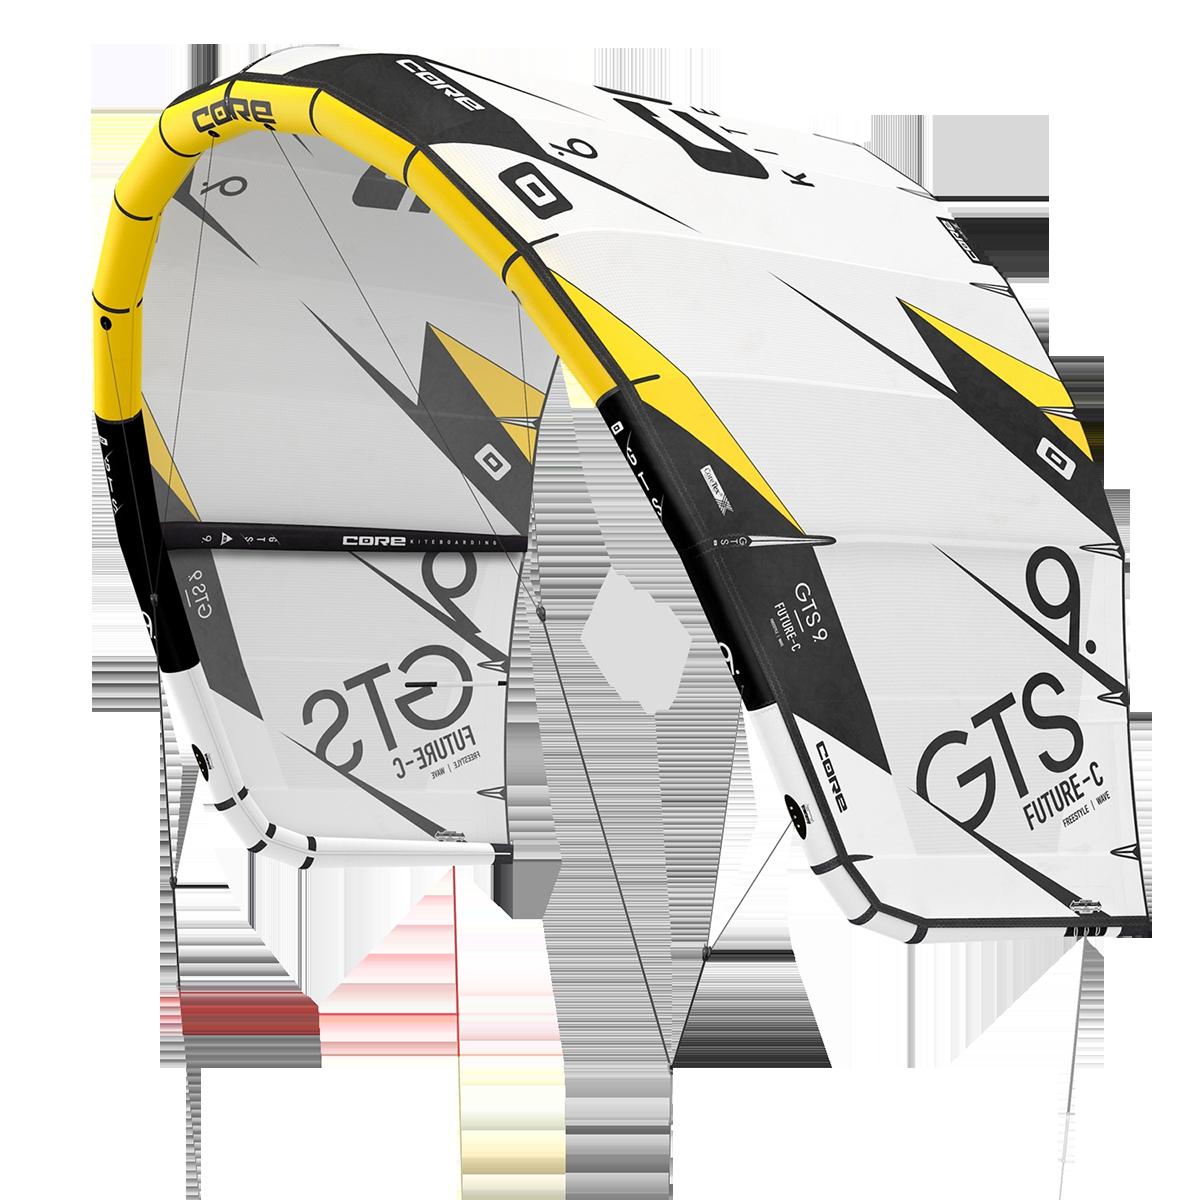 Core GTS3 - Kitesurf China